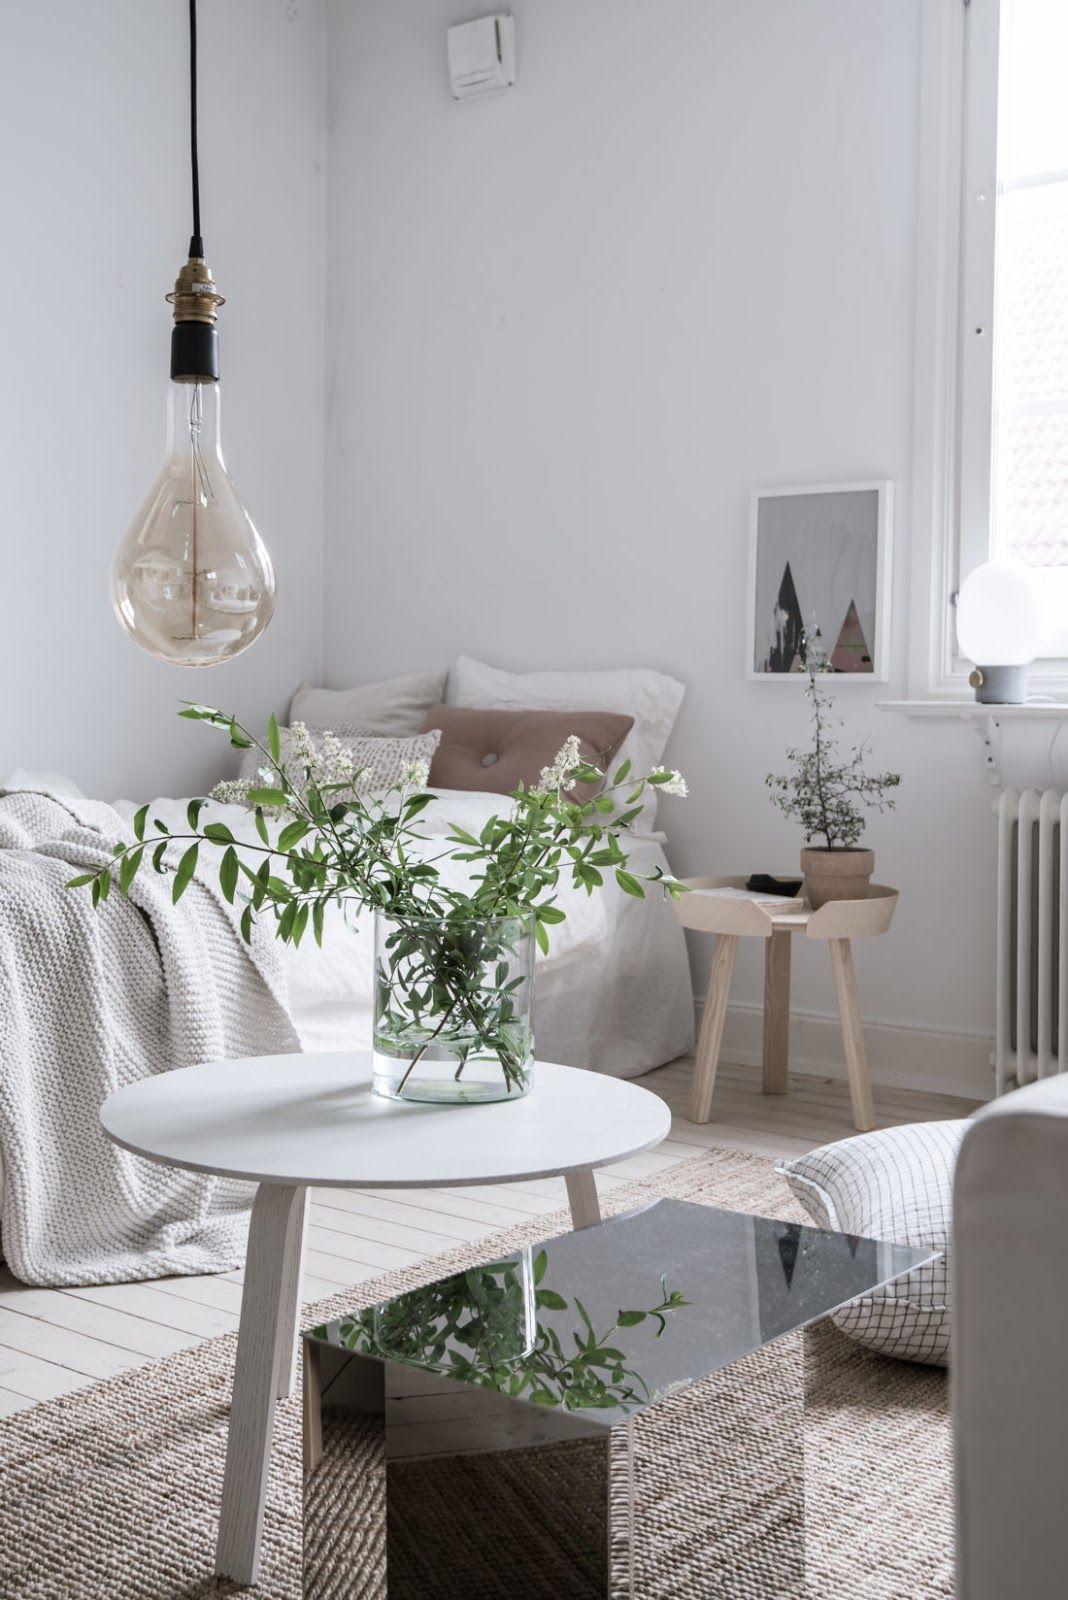 Lilihalodecoration Lidija Tomas Blog Home Decoration Diy Interior Scandinavian Design Living Inspiration Home Decor Interior Design Diy Diy Home Decor Projects